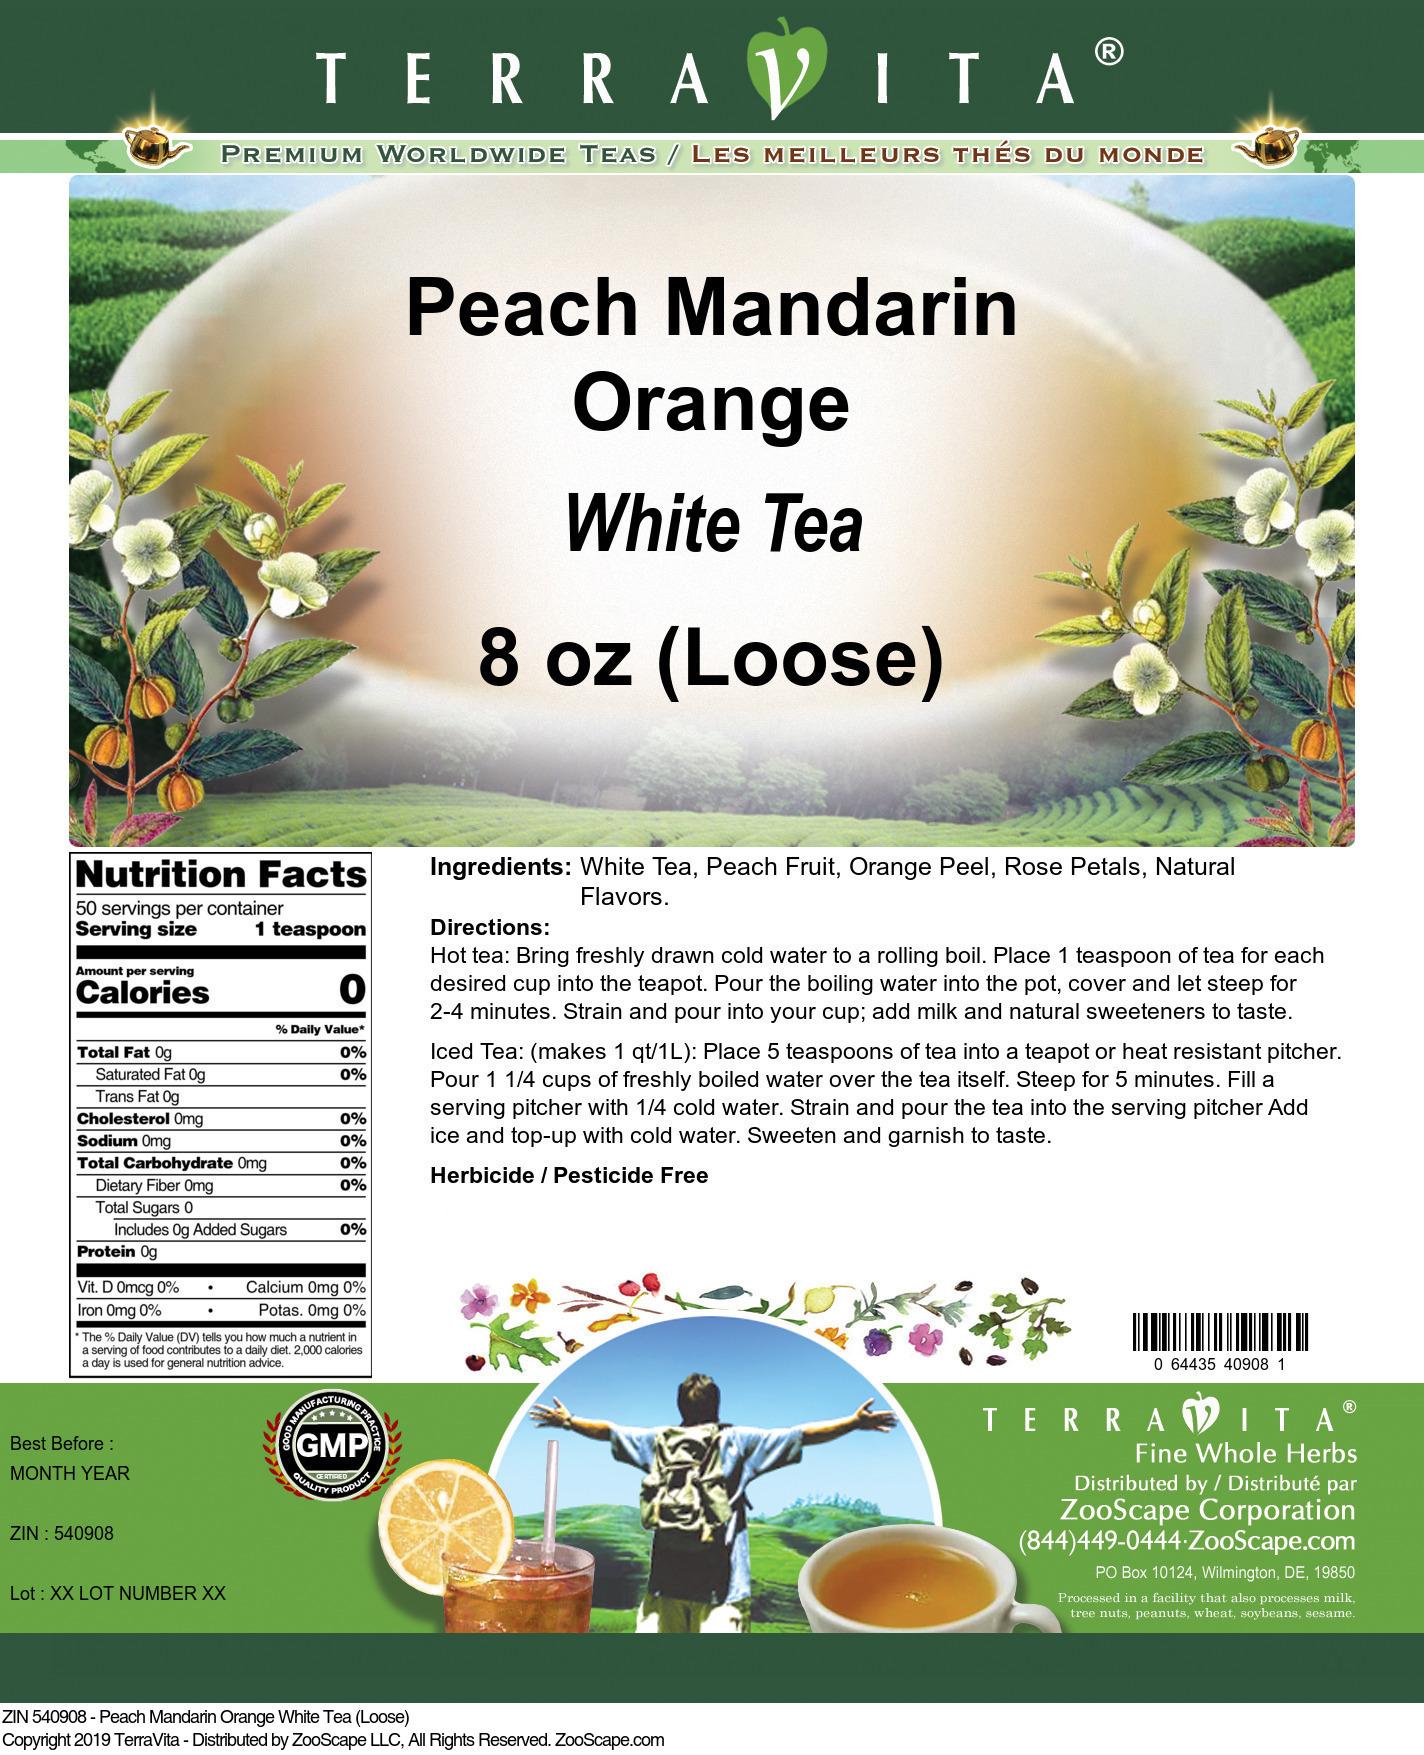 Peach Mandarin Orange White Tea